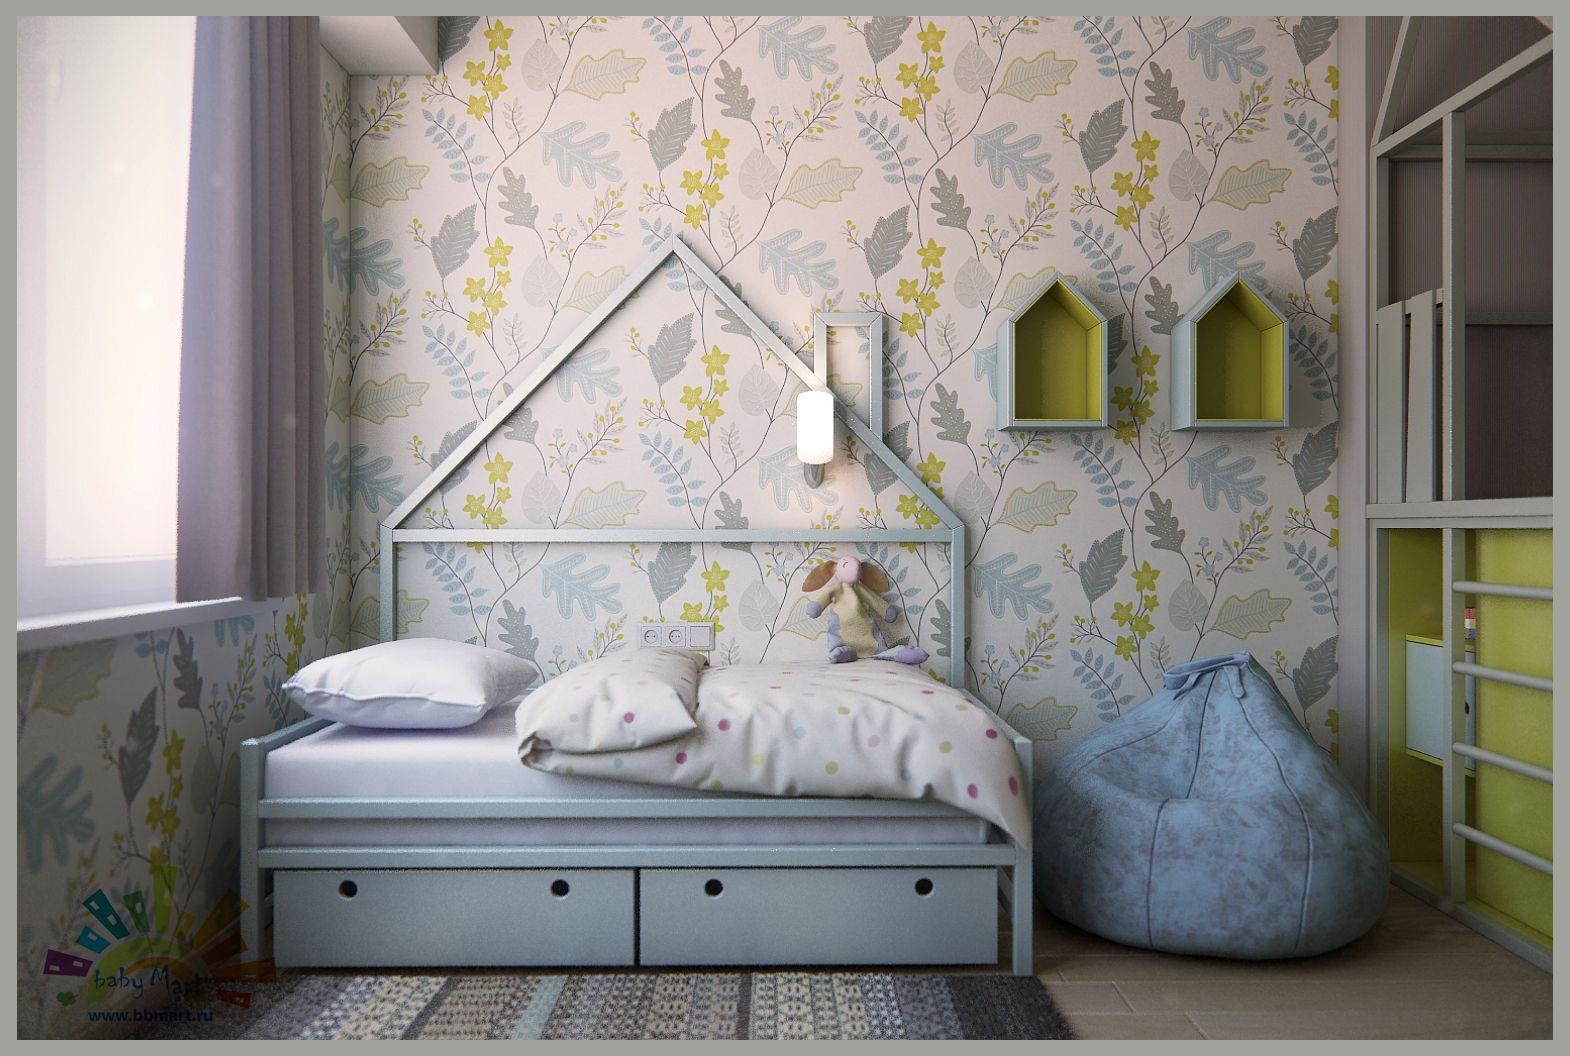 Teenage loft bedroom designs  o Kiddo o Lofty  Kids Loft Bed  детская  Галерея ddd